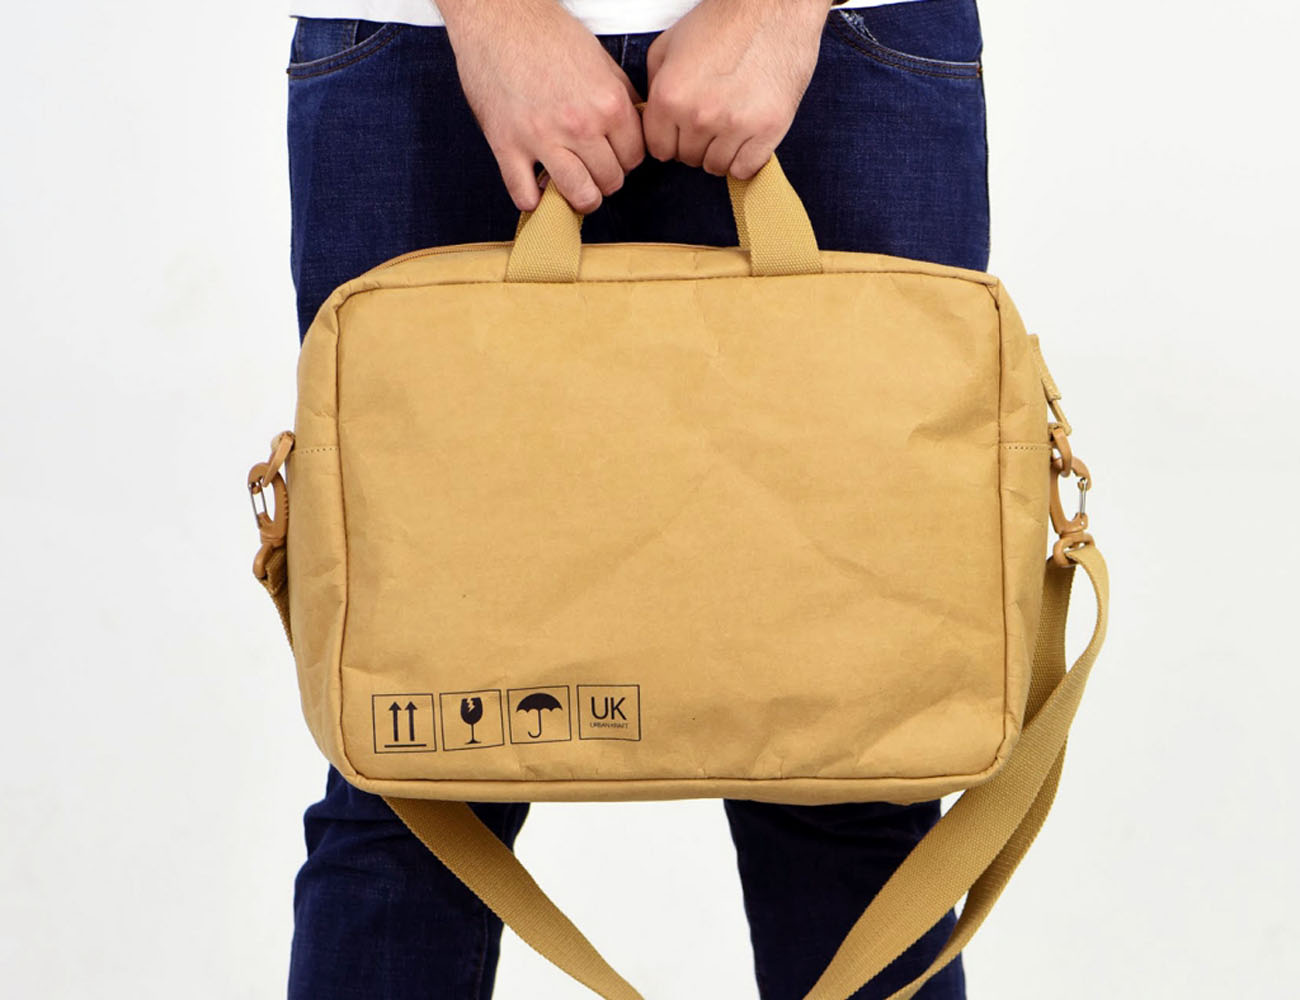 URBAN KRAFT: Strongest Paper Bags & Accessories | Guaranteed